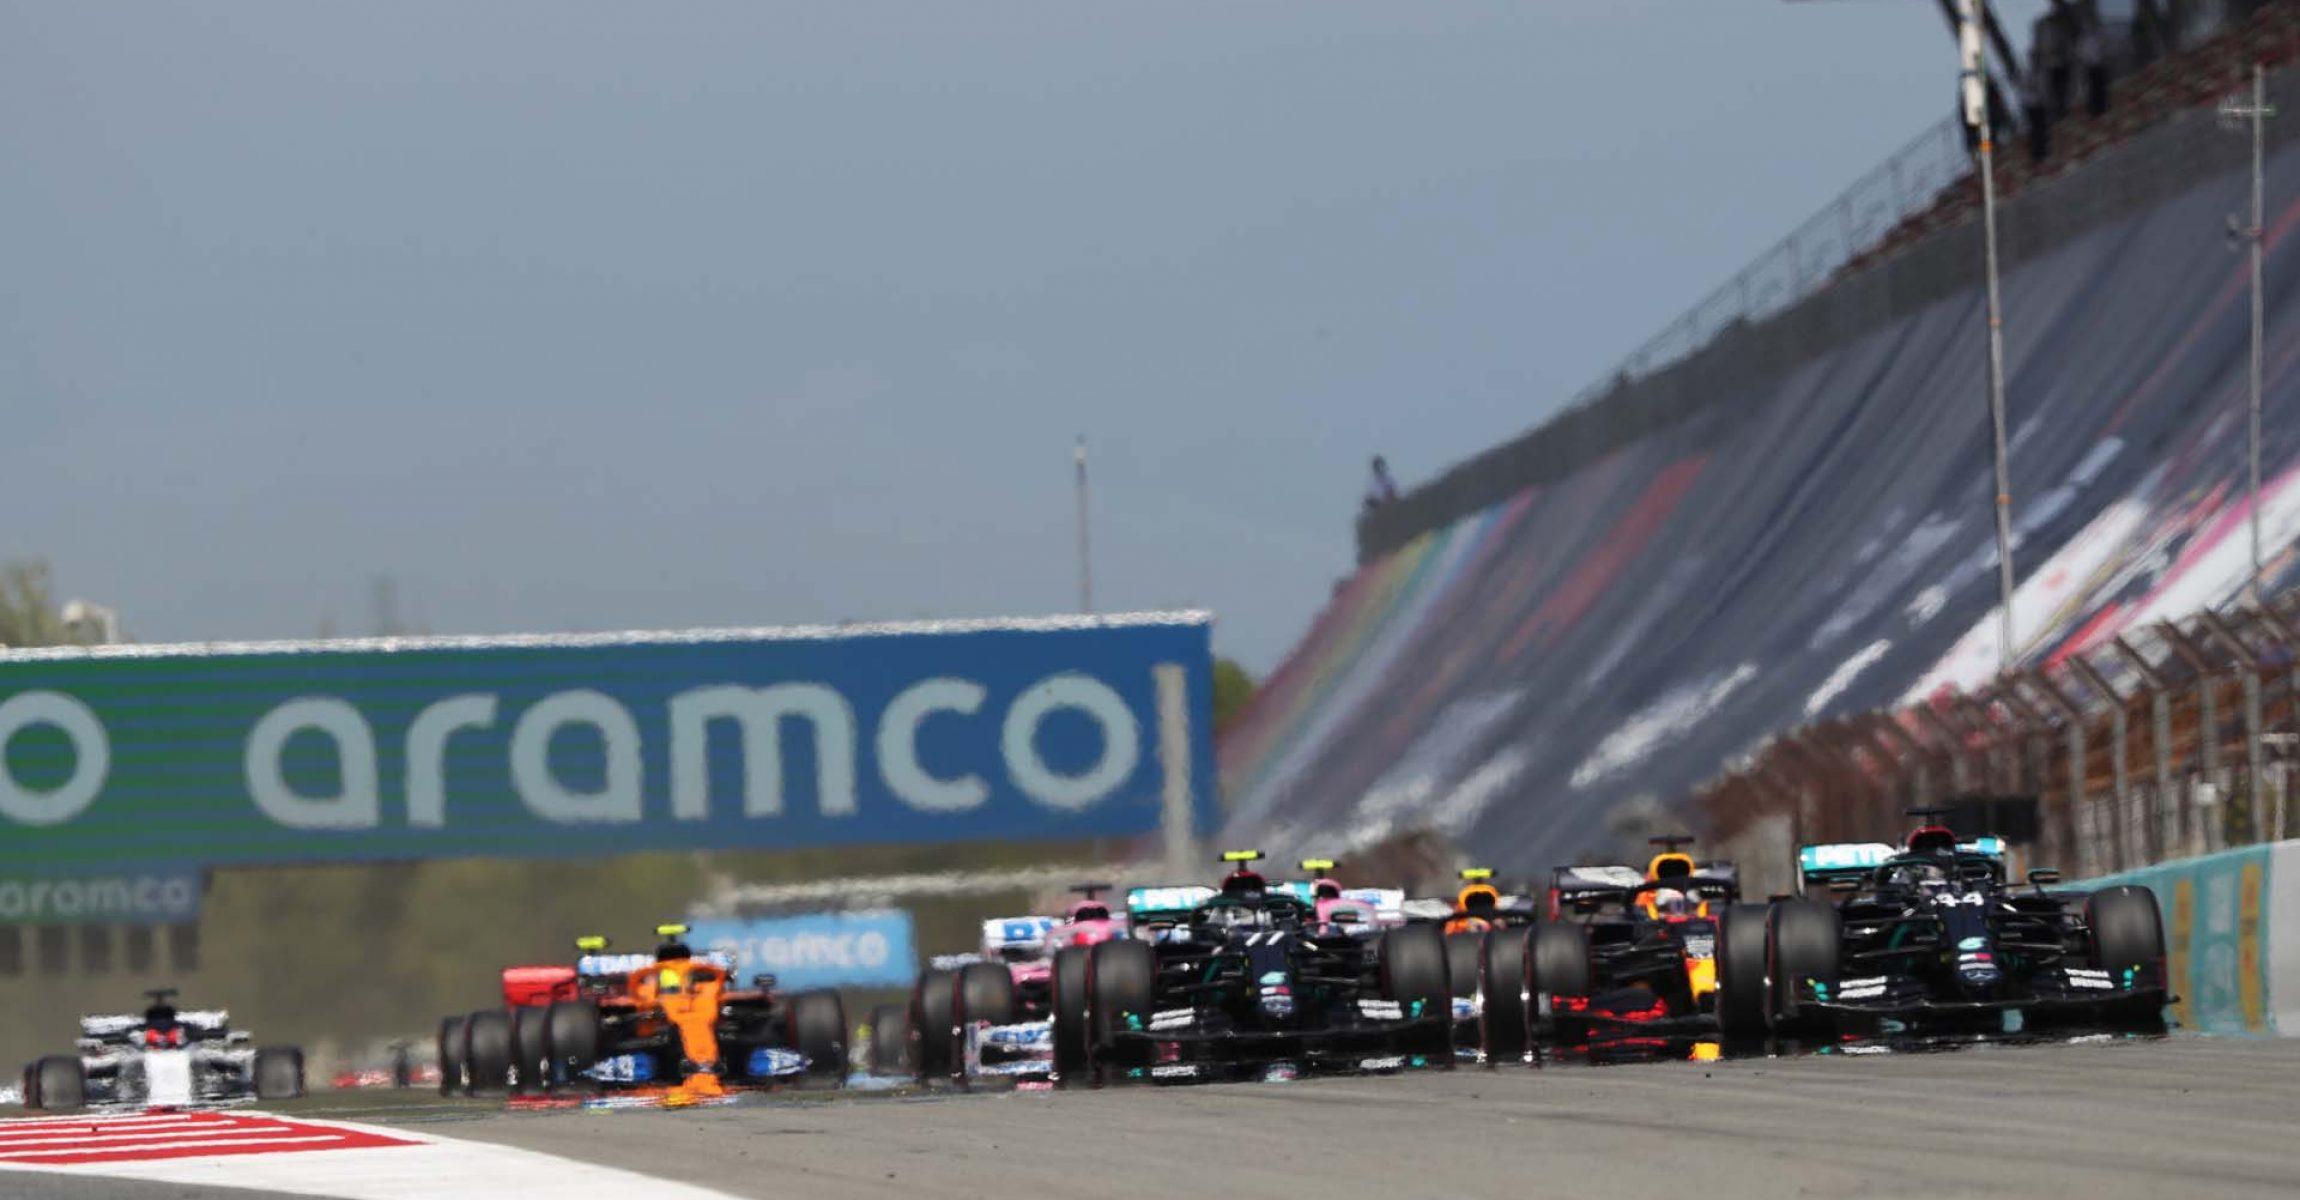 Spanish Grand Prix 2020, start